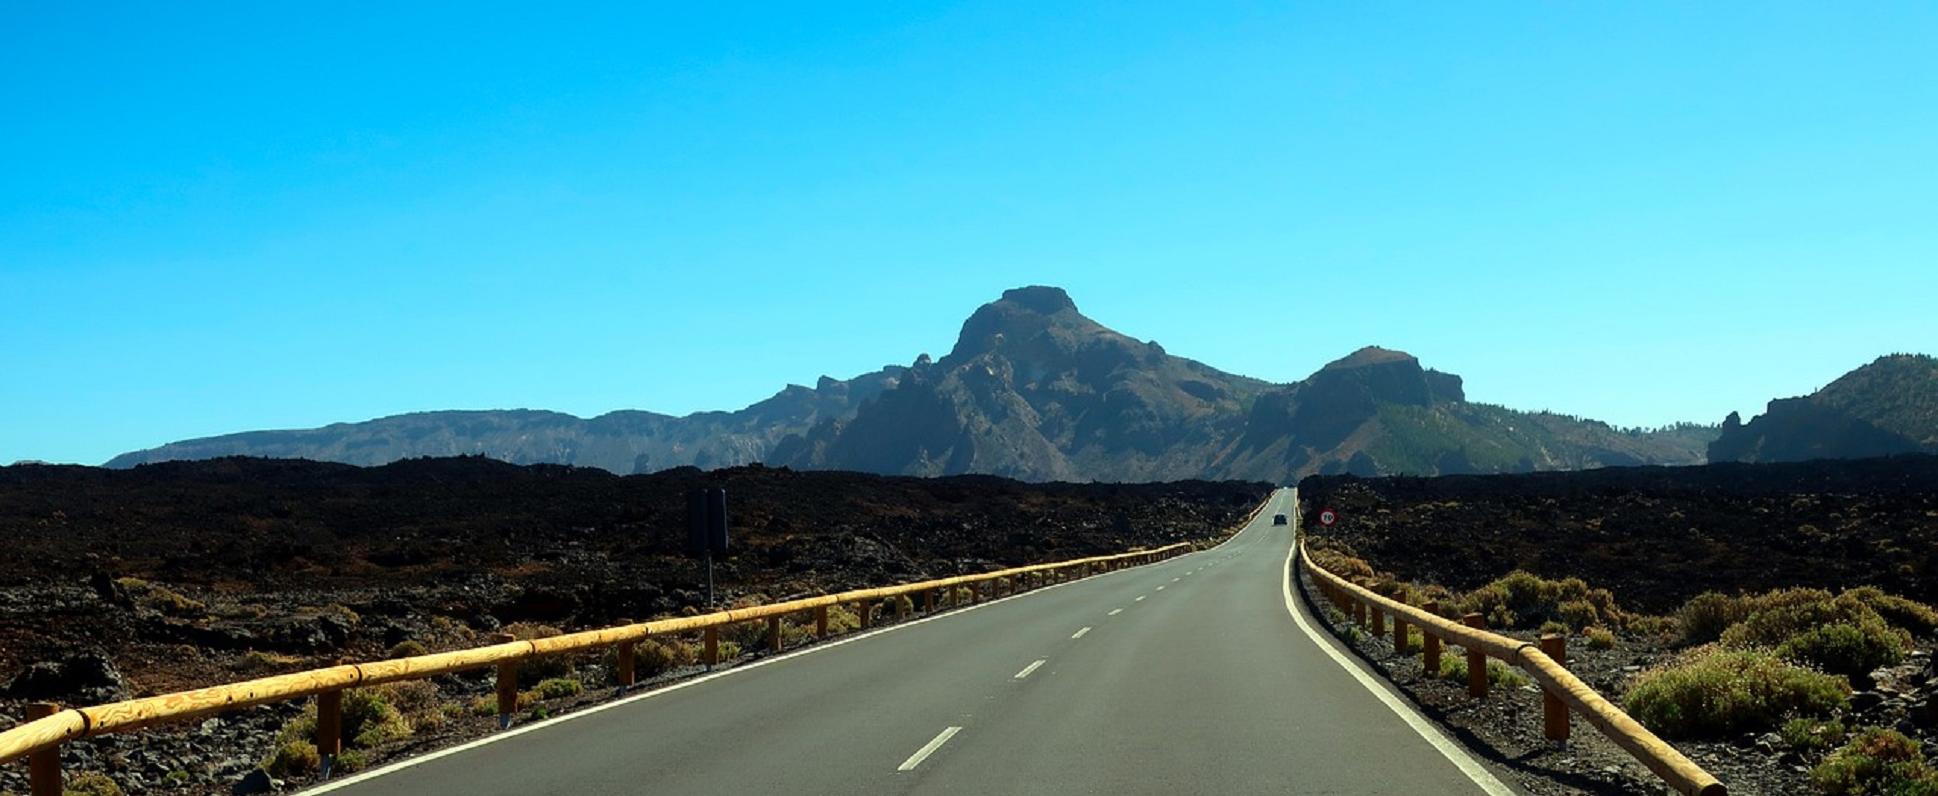 Mega pont in Tenerife